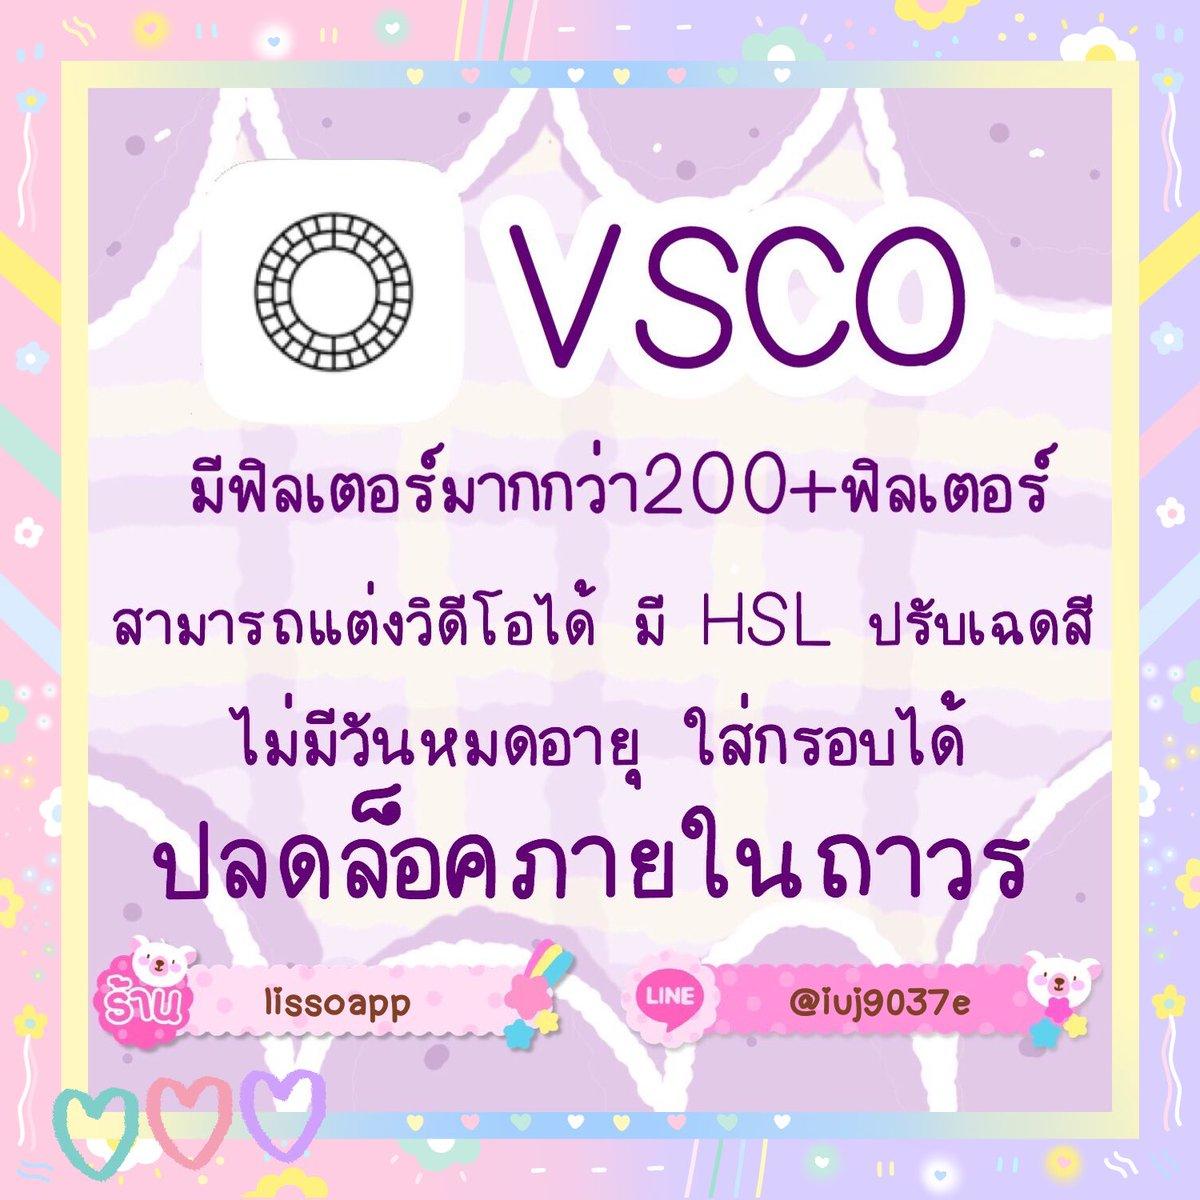 💖💖 vsco x ราคา 40฿ 💖💖 💙ใช้ไอดีร้านในการเข้าล็อคอิน 💙ปลดได้ทั้ง ios & android 💙มีเฉดสีHSL พร้อมแต่ง 💙ได้ฟิลเตอร์ 200+ ฟิลเตอร์ 💙สามารถ import วิดีโอมาแต่งได้จ้า 💙มีกรอบสีพื้นแต่งภาพได้สวยจ้า #vscocam #vsco #รับปลดvsco #รับปลดvscocam #แอพแต่งรูป #แอพดีบอกต่อ #แนะนำแอพ